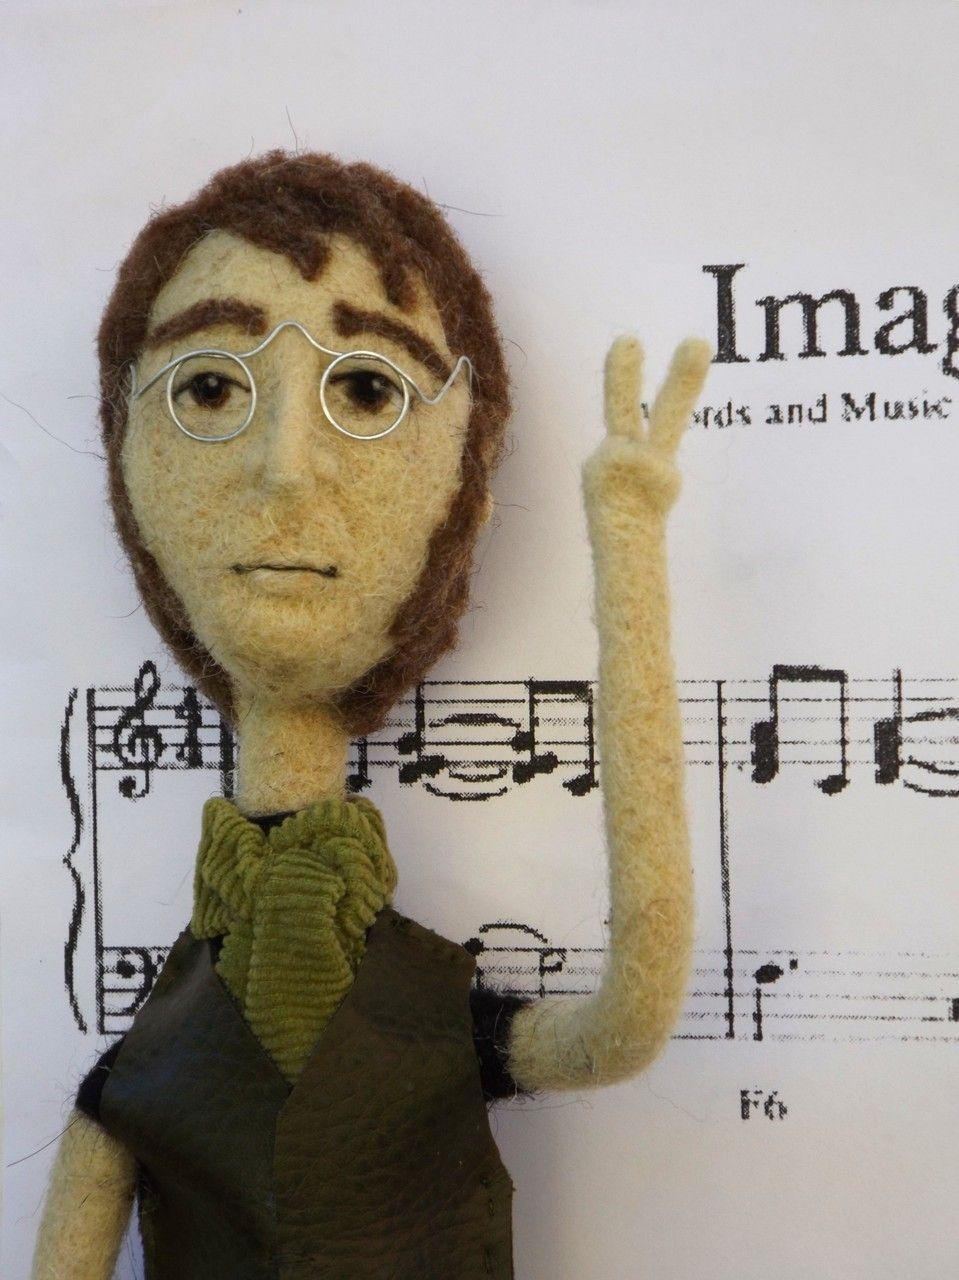 john lennon doll, custom order. #johnlennon #thebeatles #needlefelt #uniquegift #ooak #artdoll